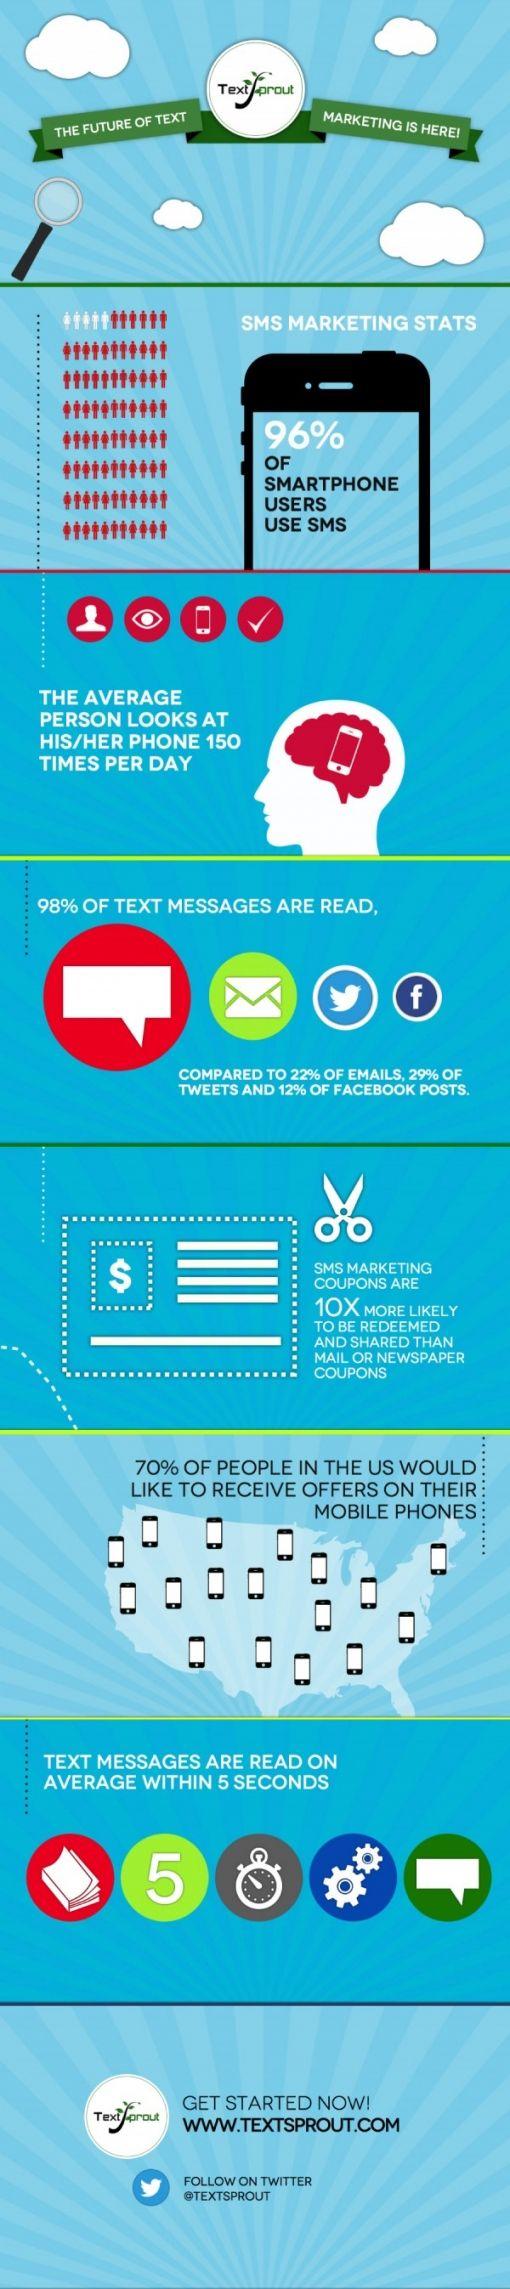 21 best Sales Leads images on Pinterest | Digital marketing, Tools ...